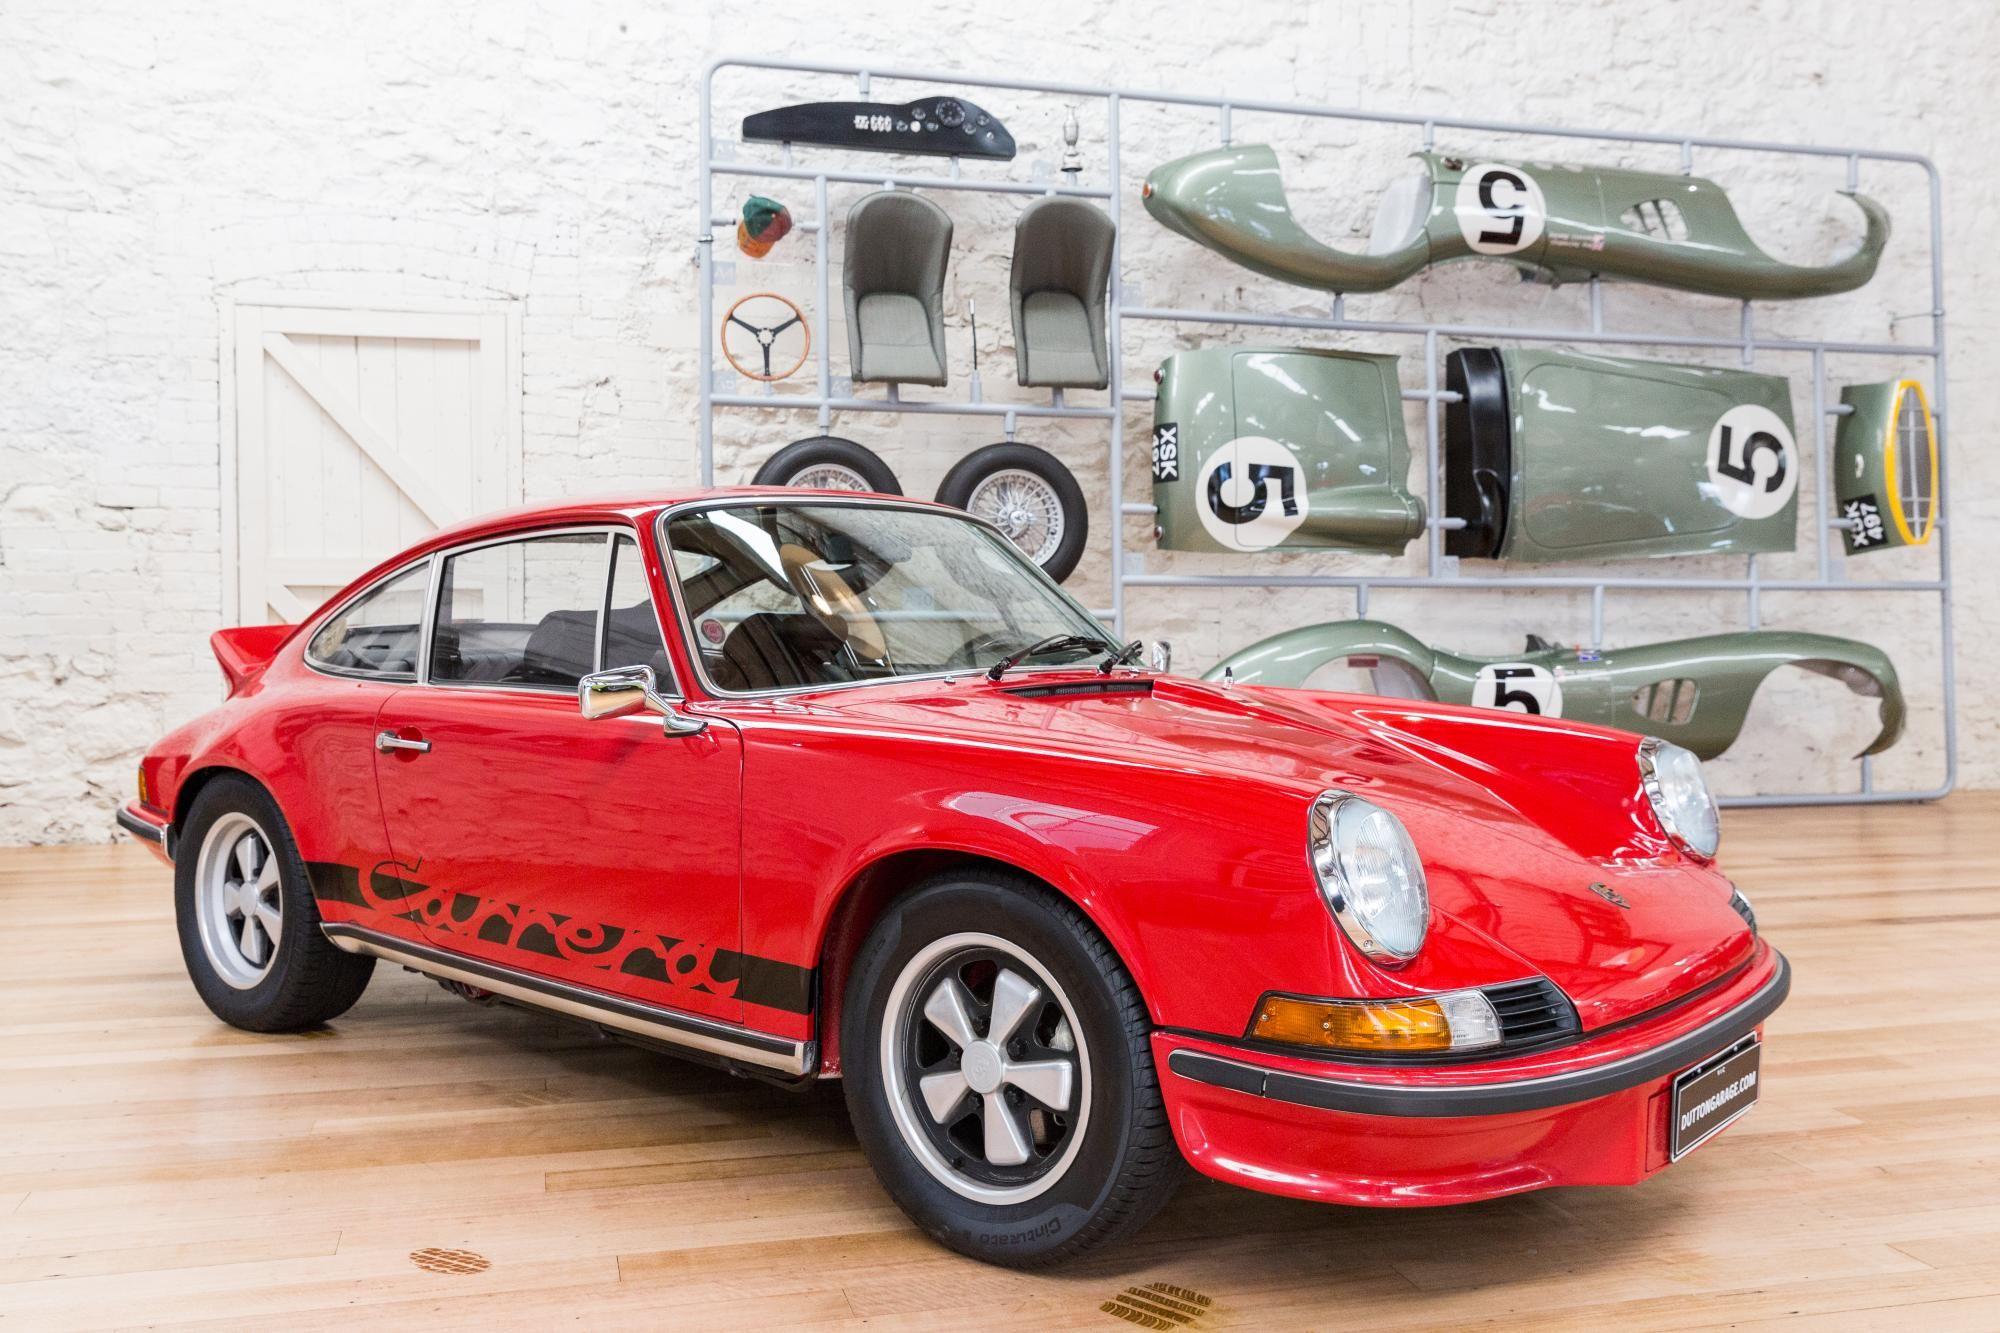 Image result for bahia red porsche rs | Porsche rs | Pinterest ...